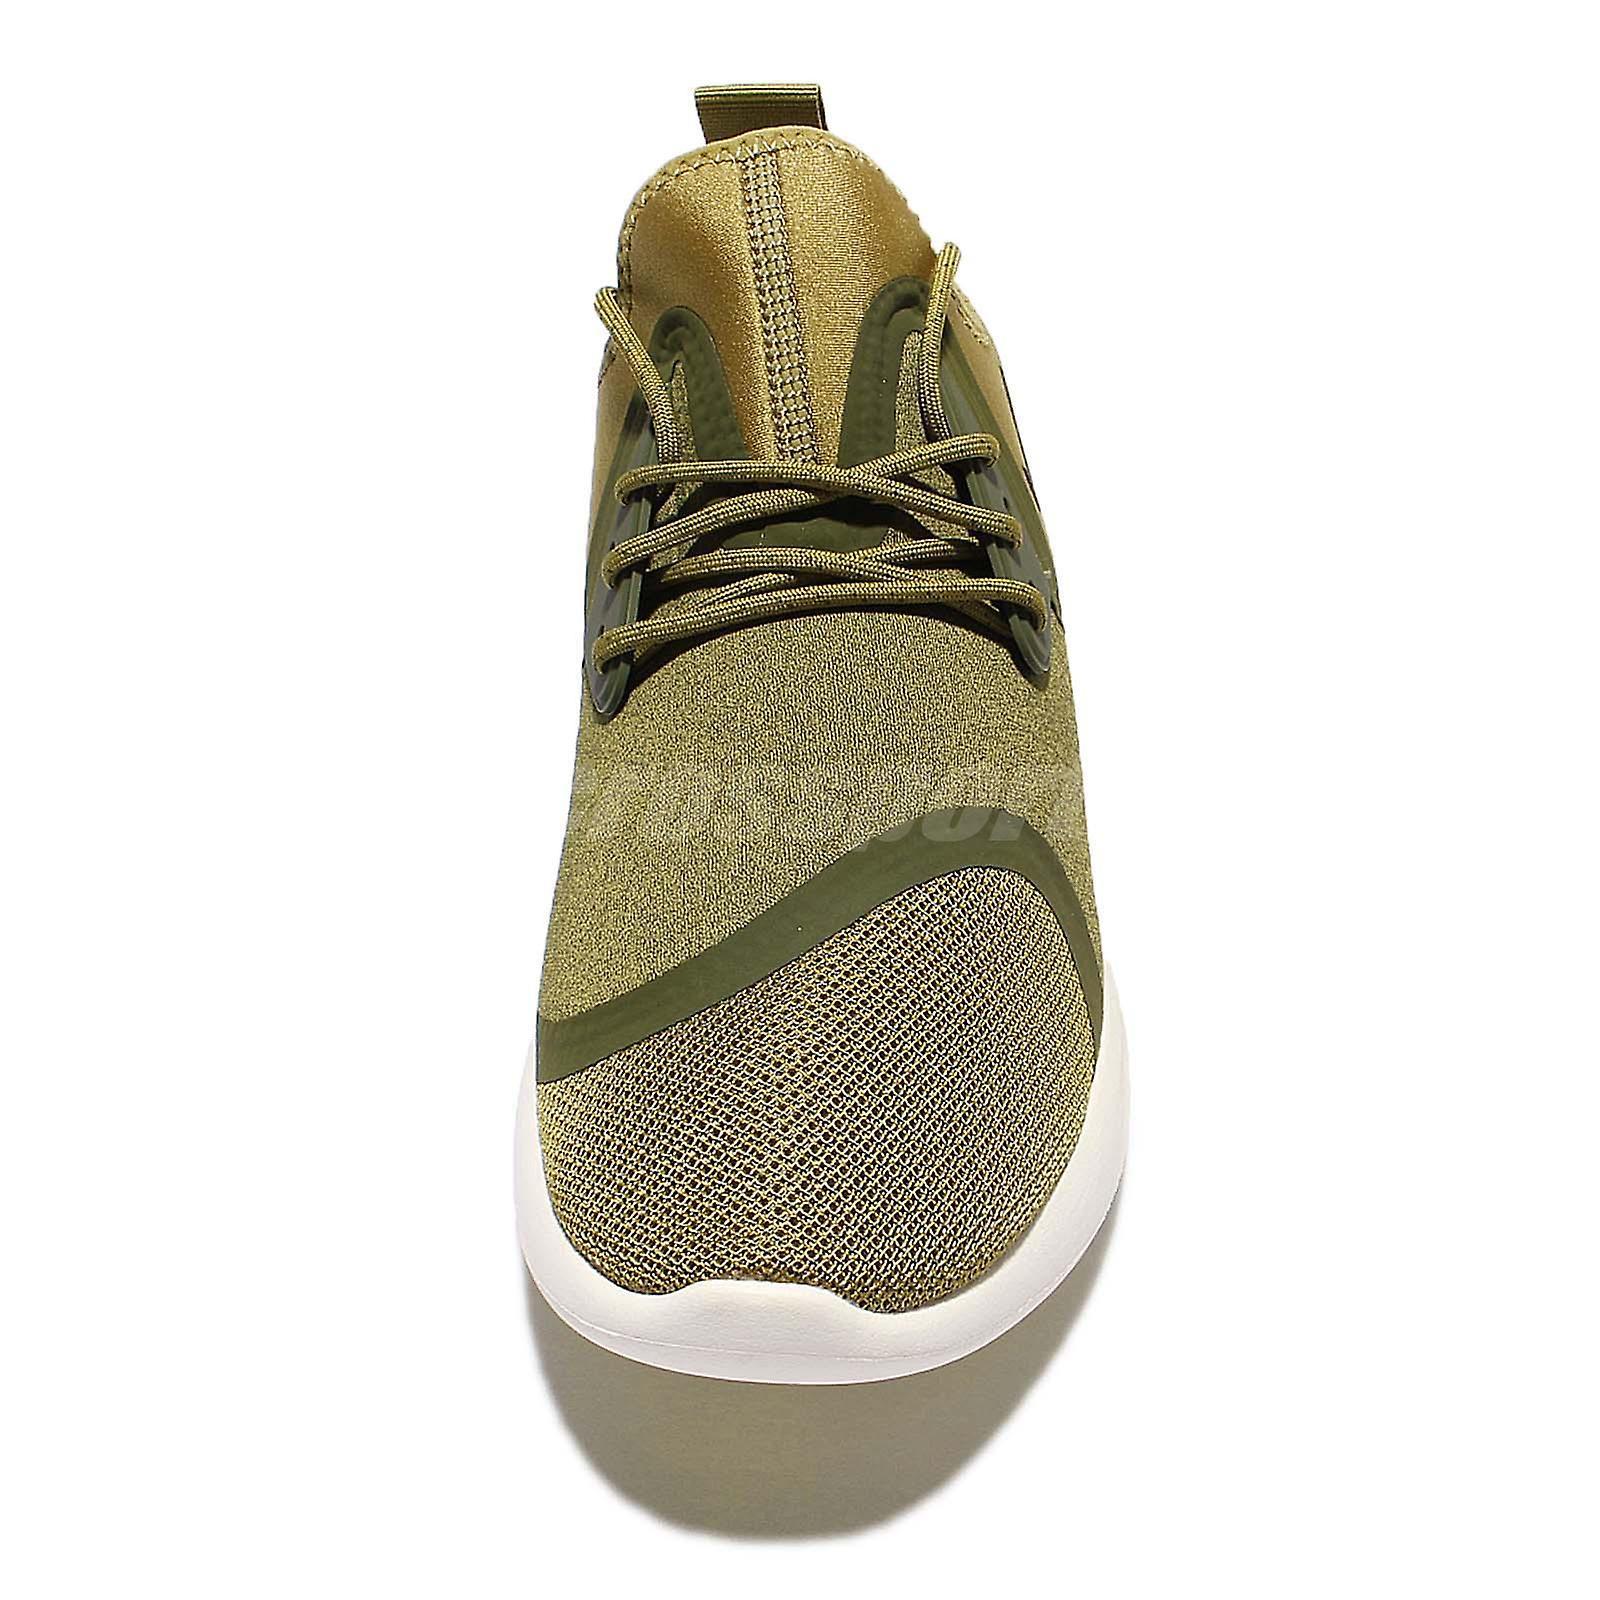 Nike Lunarcharge eteriska 923619 300 Mens utbildare